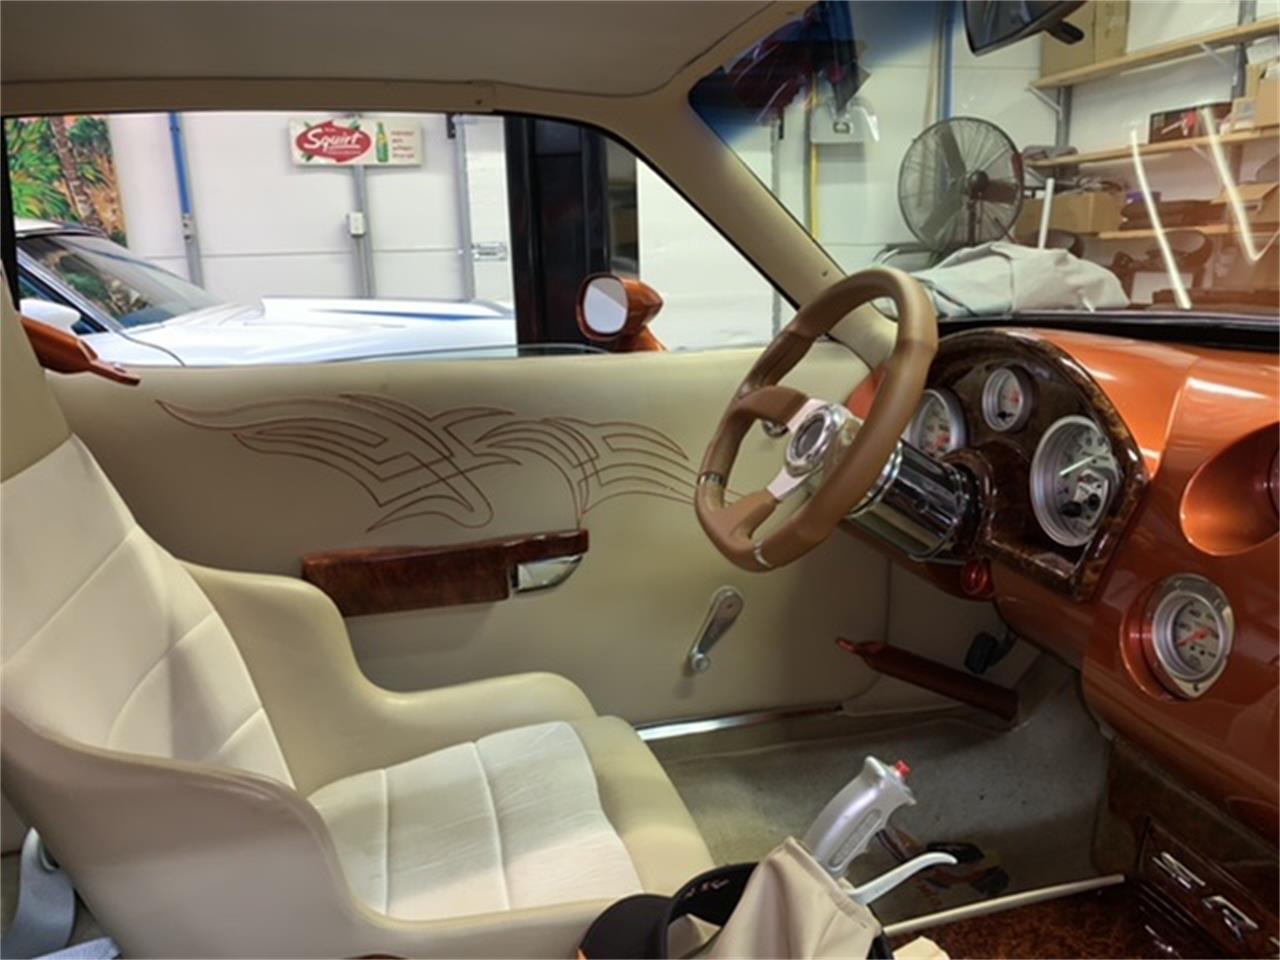 1973 Plymouth Cuda (CC-1394274) for sale in Allentown, Pennsylvania